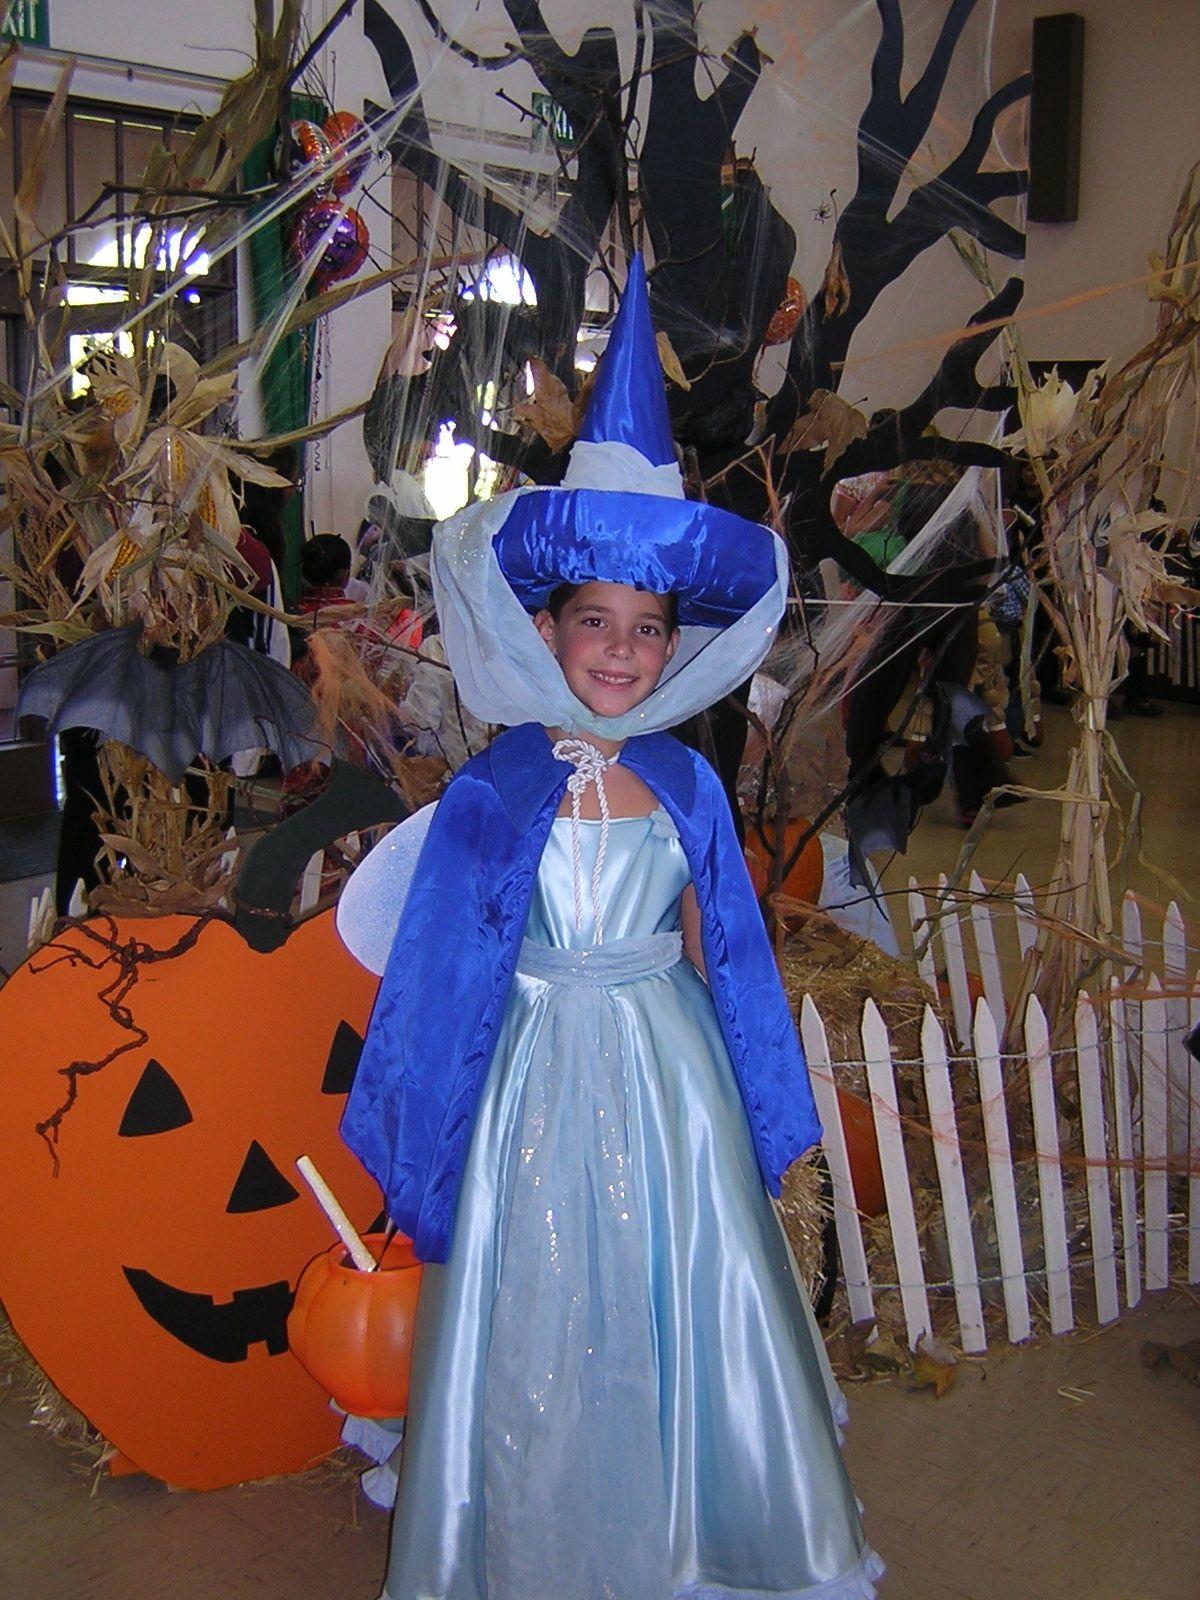 Fairy Merryweather by Talina del Rio